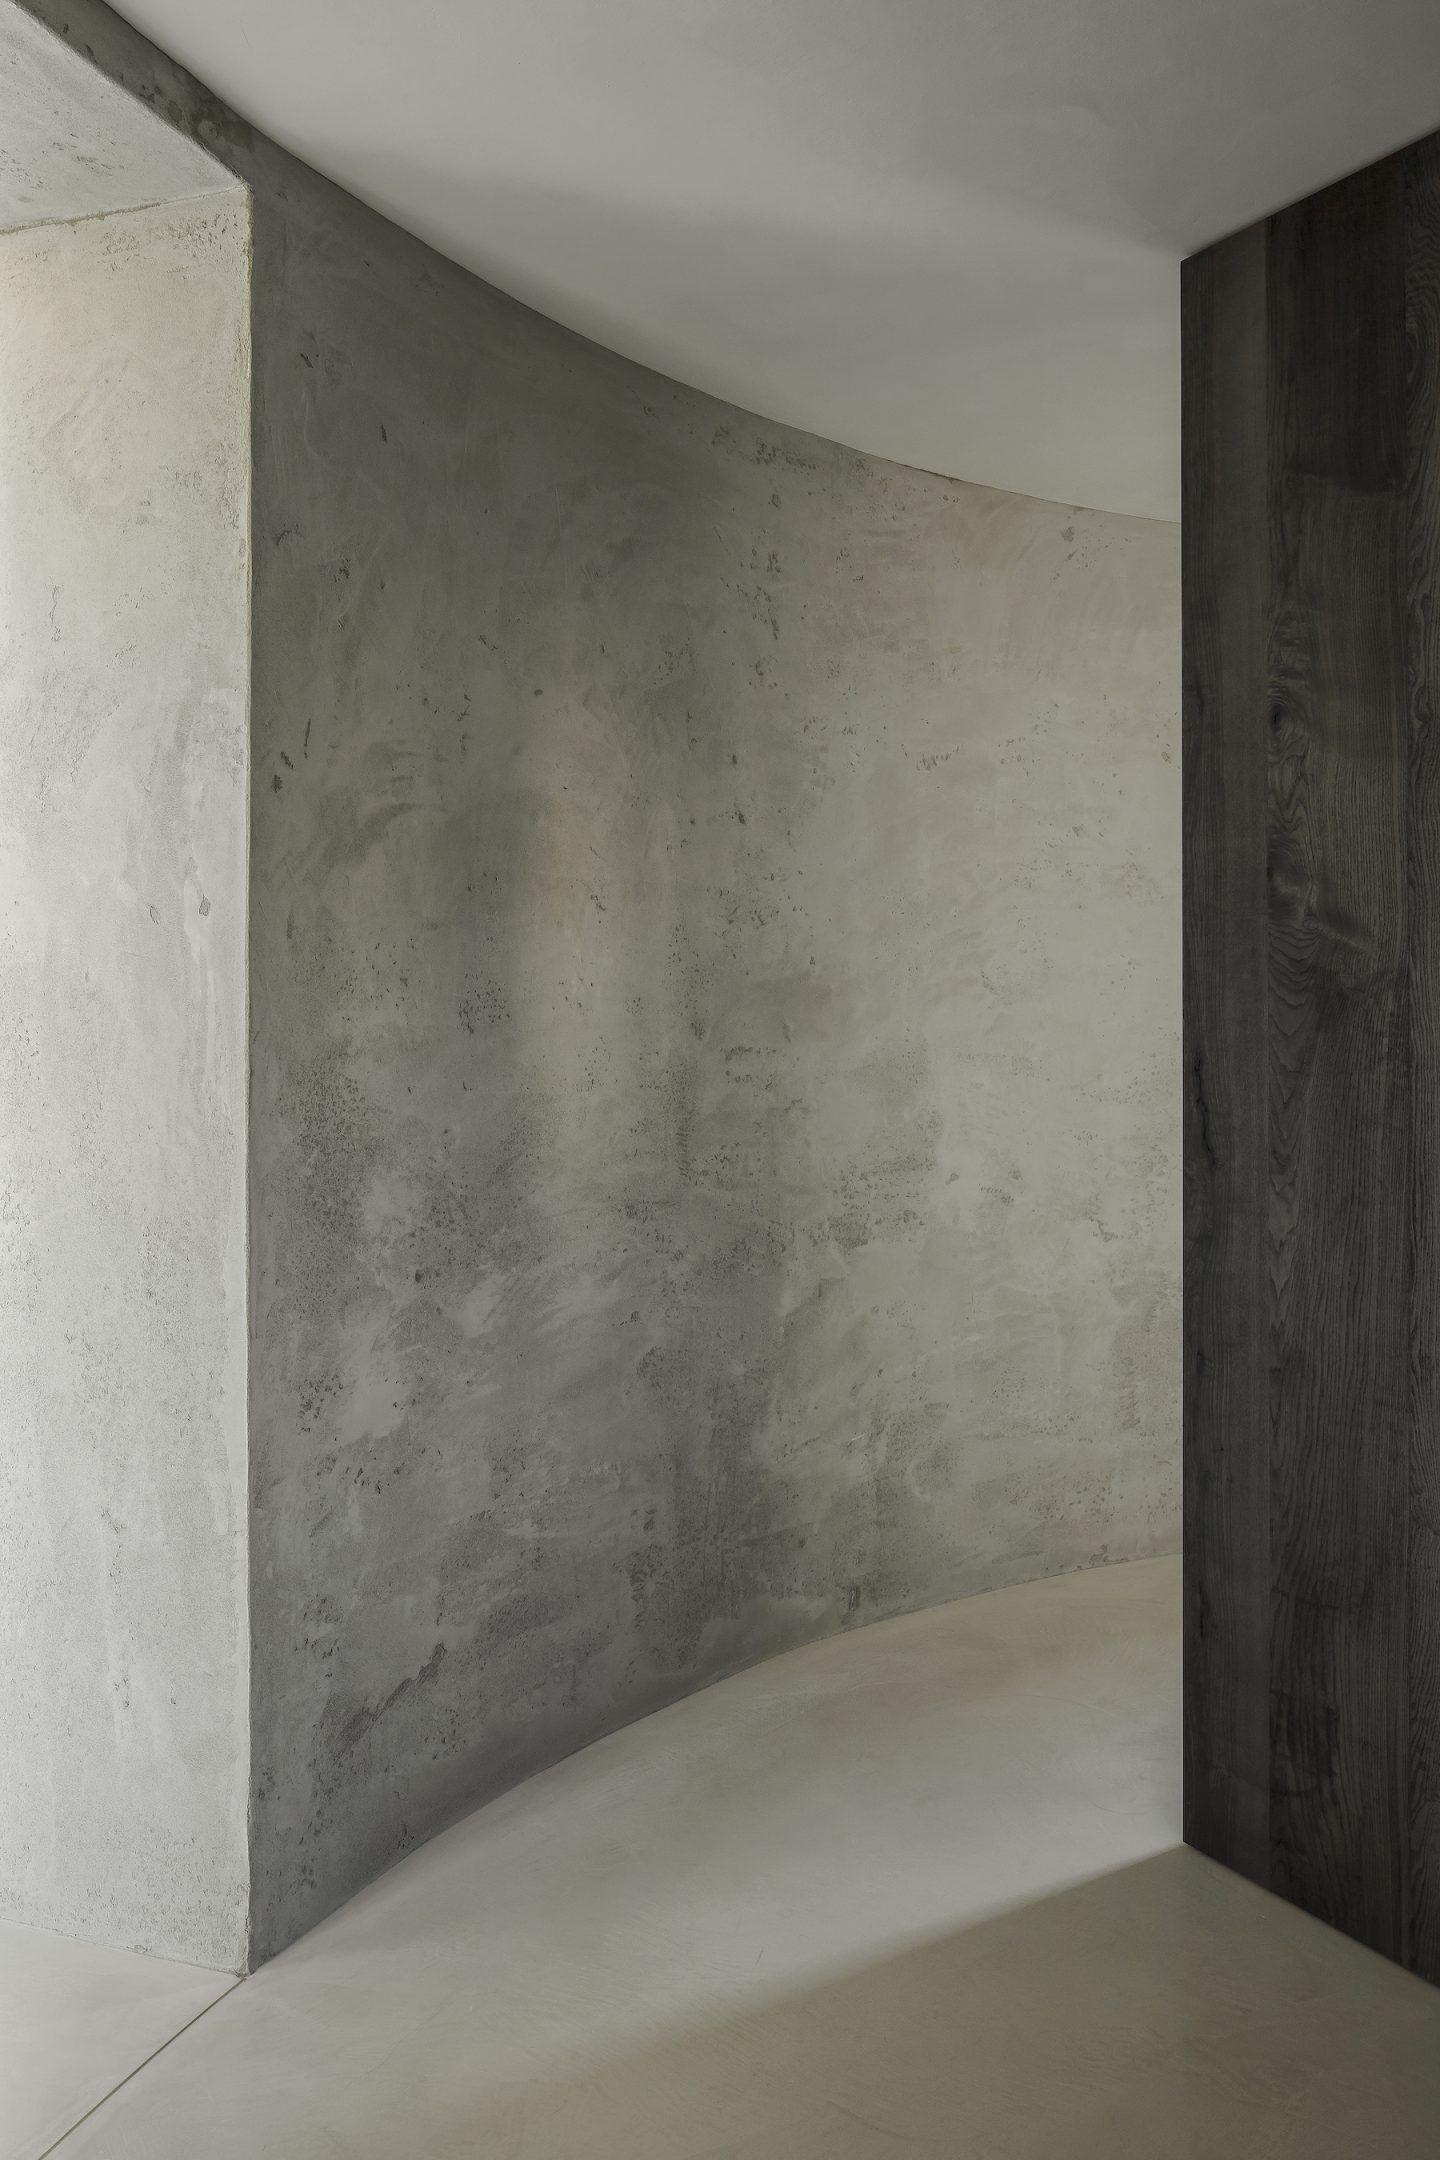 IGNANT-Architecture-Arjaan-De-Feyter-Silo-Apartment-15